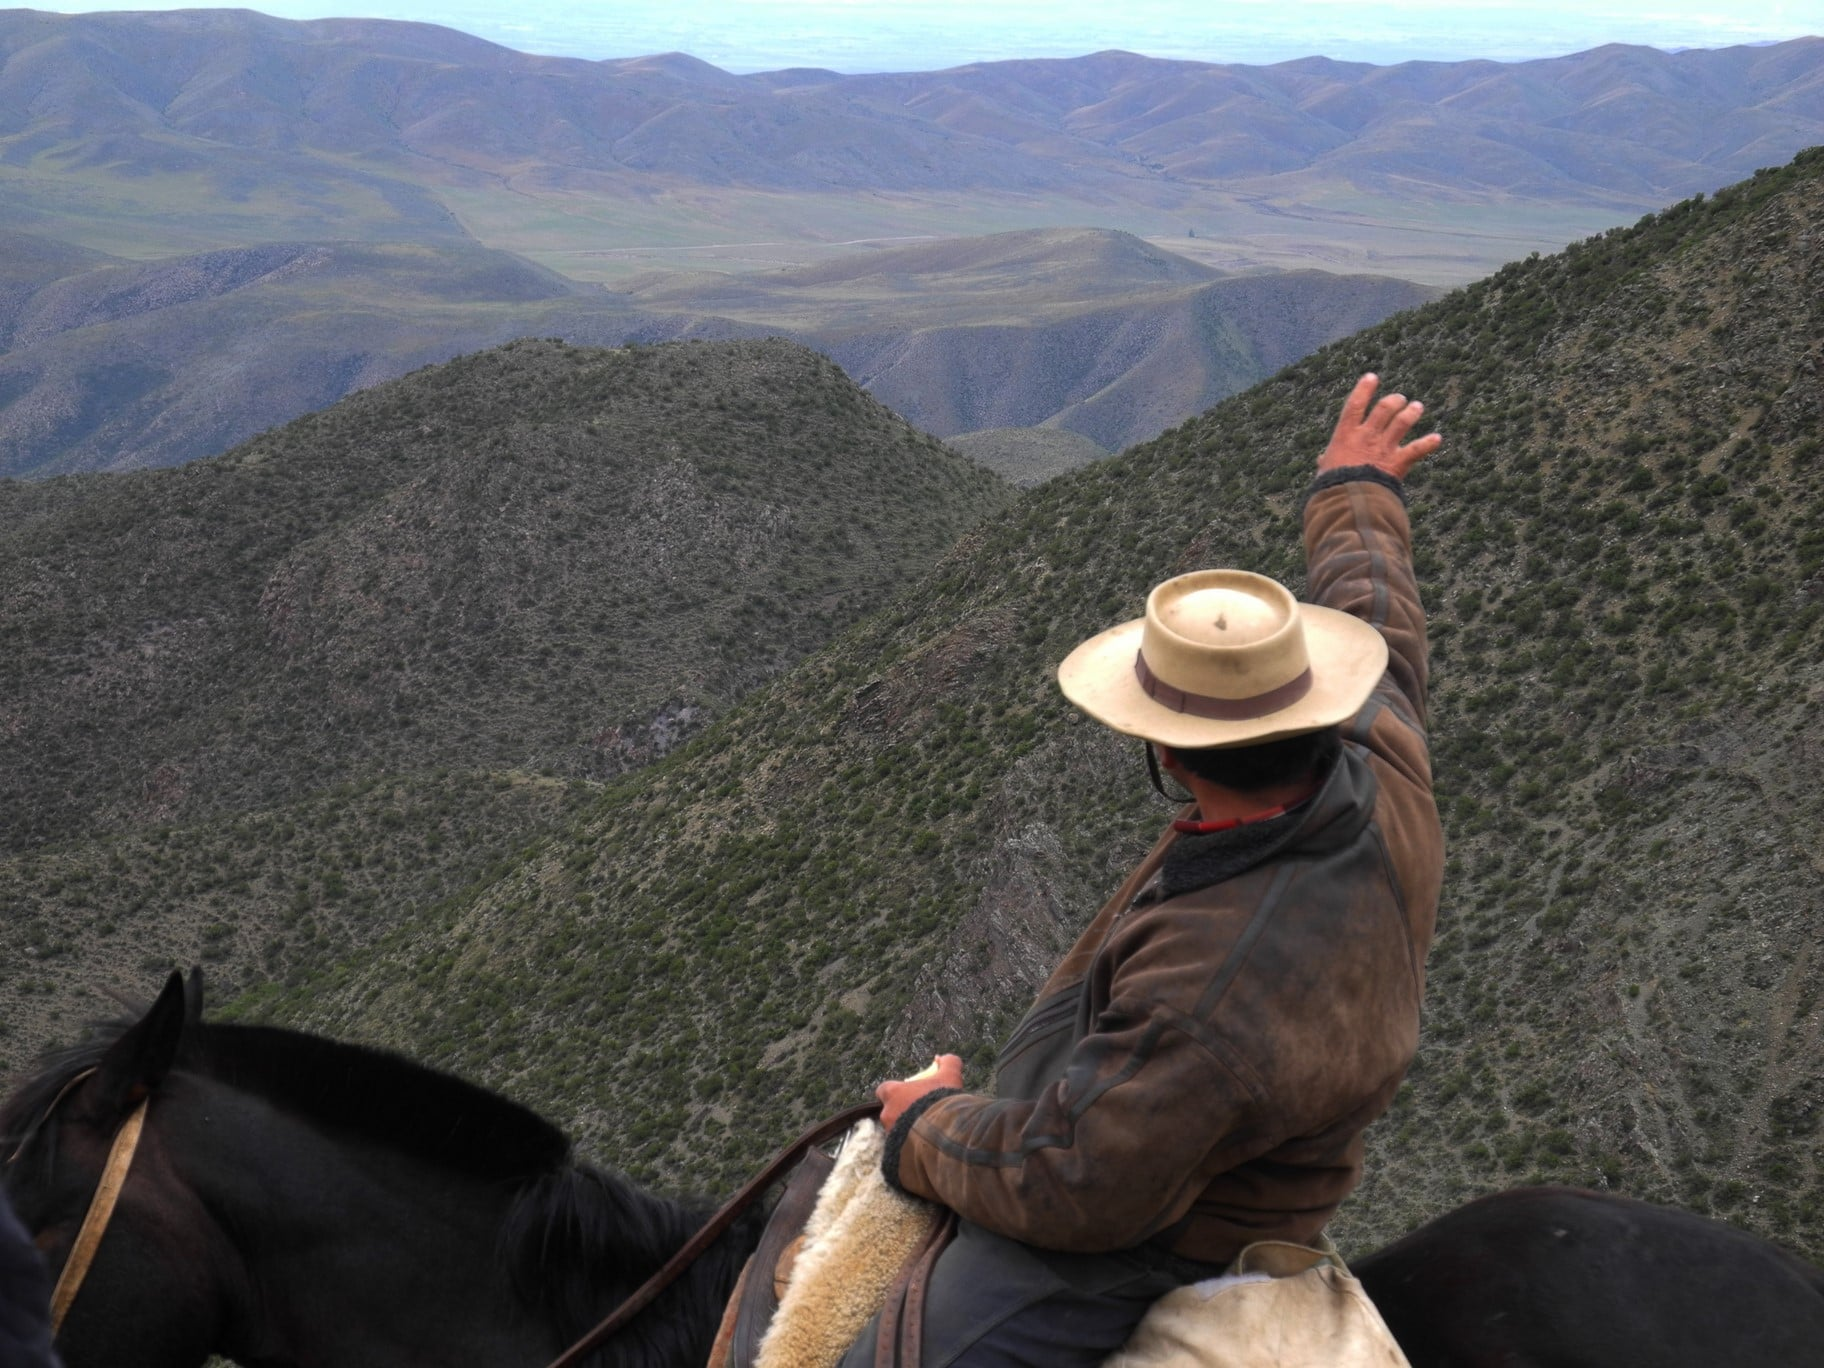 wine-TROTTERS_wine-tourism-agency_tour_trekking_hiking_horseback-riding_Andes_103 WEB.jpg